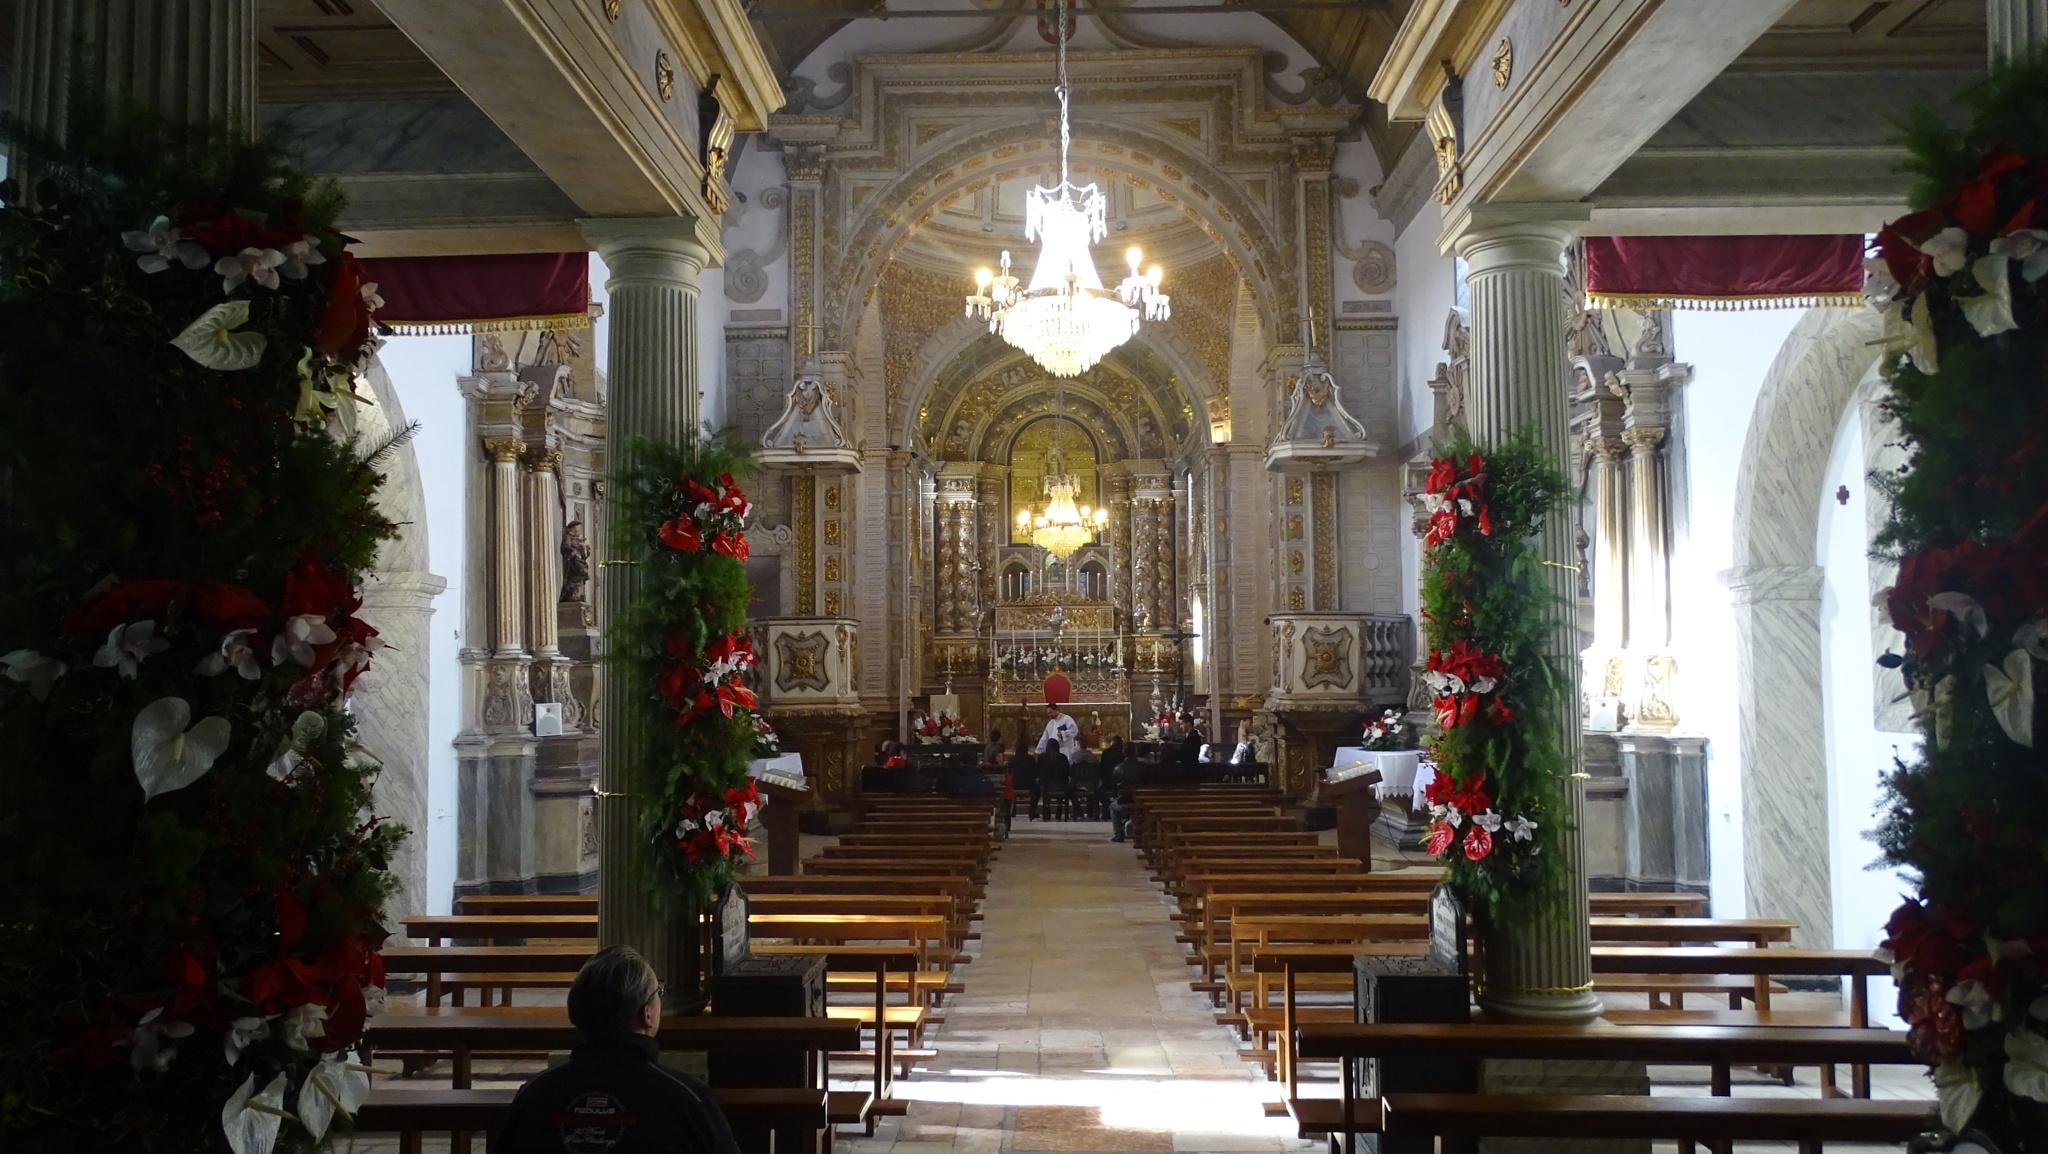 inside nazaré cathedral by Luis serra